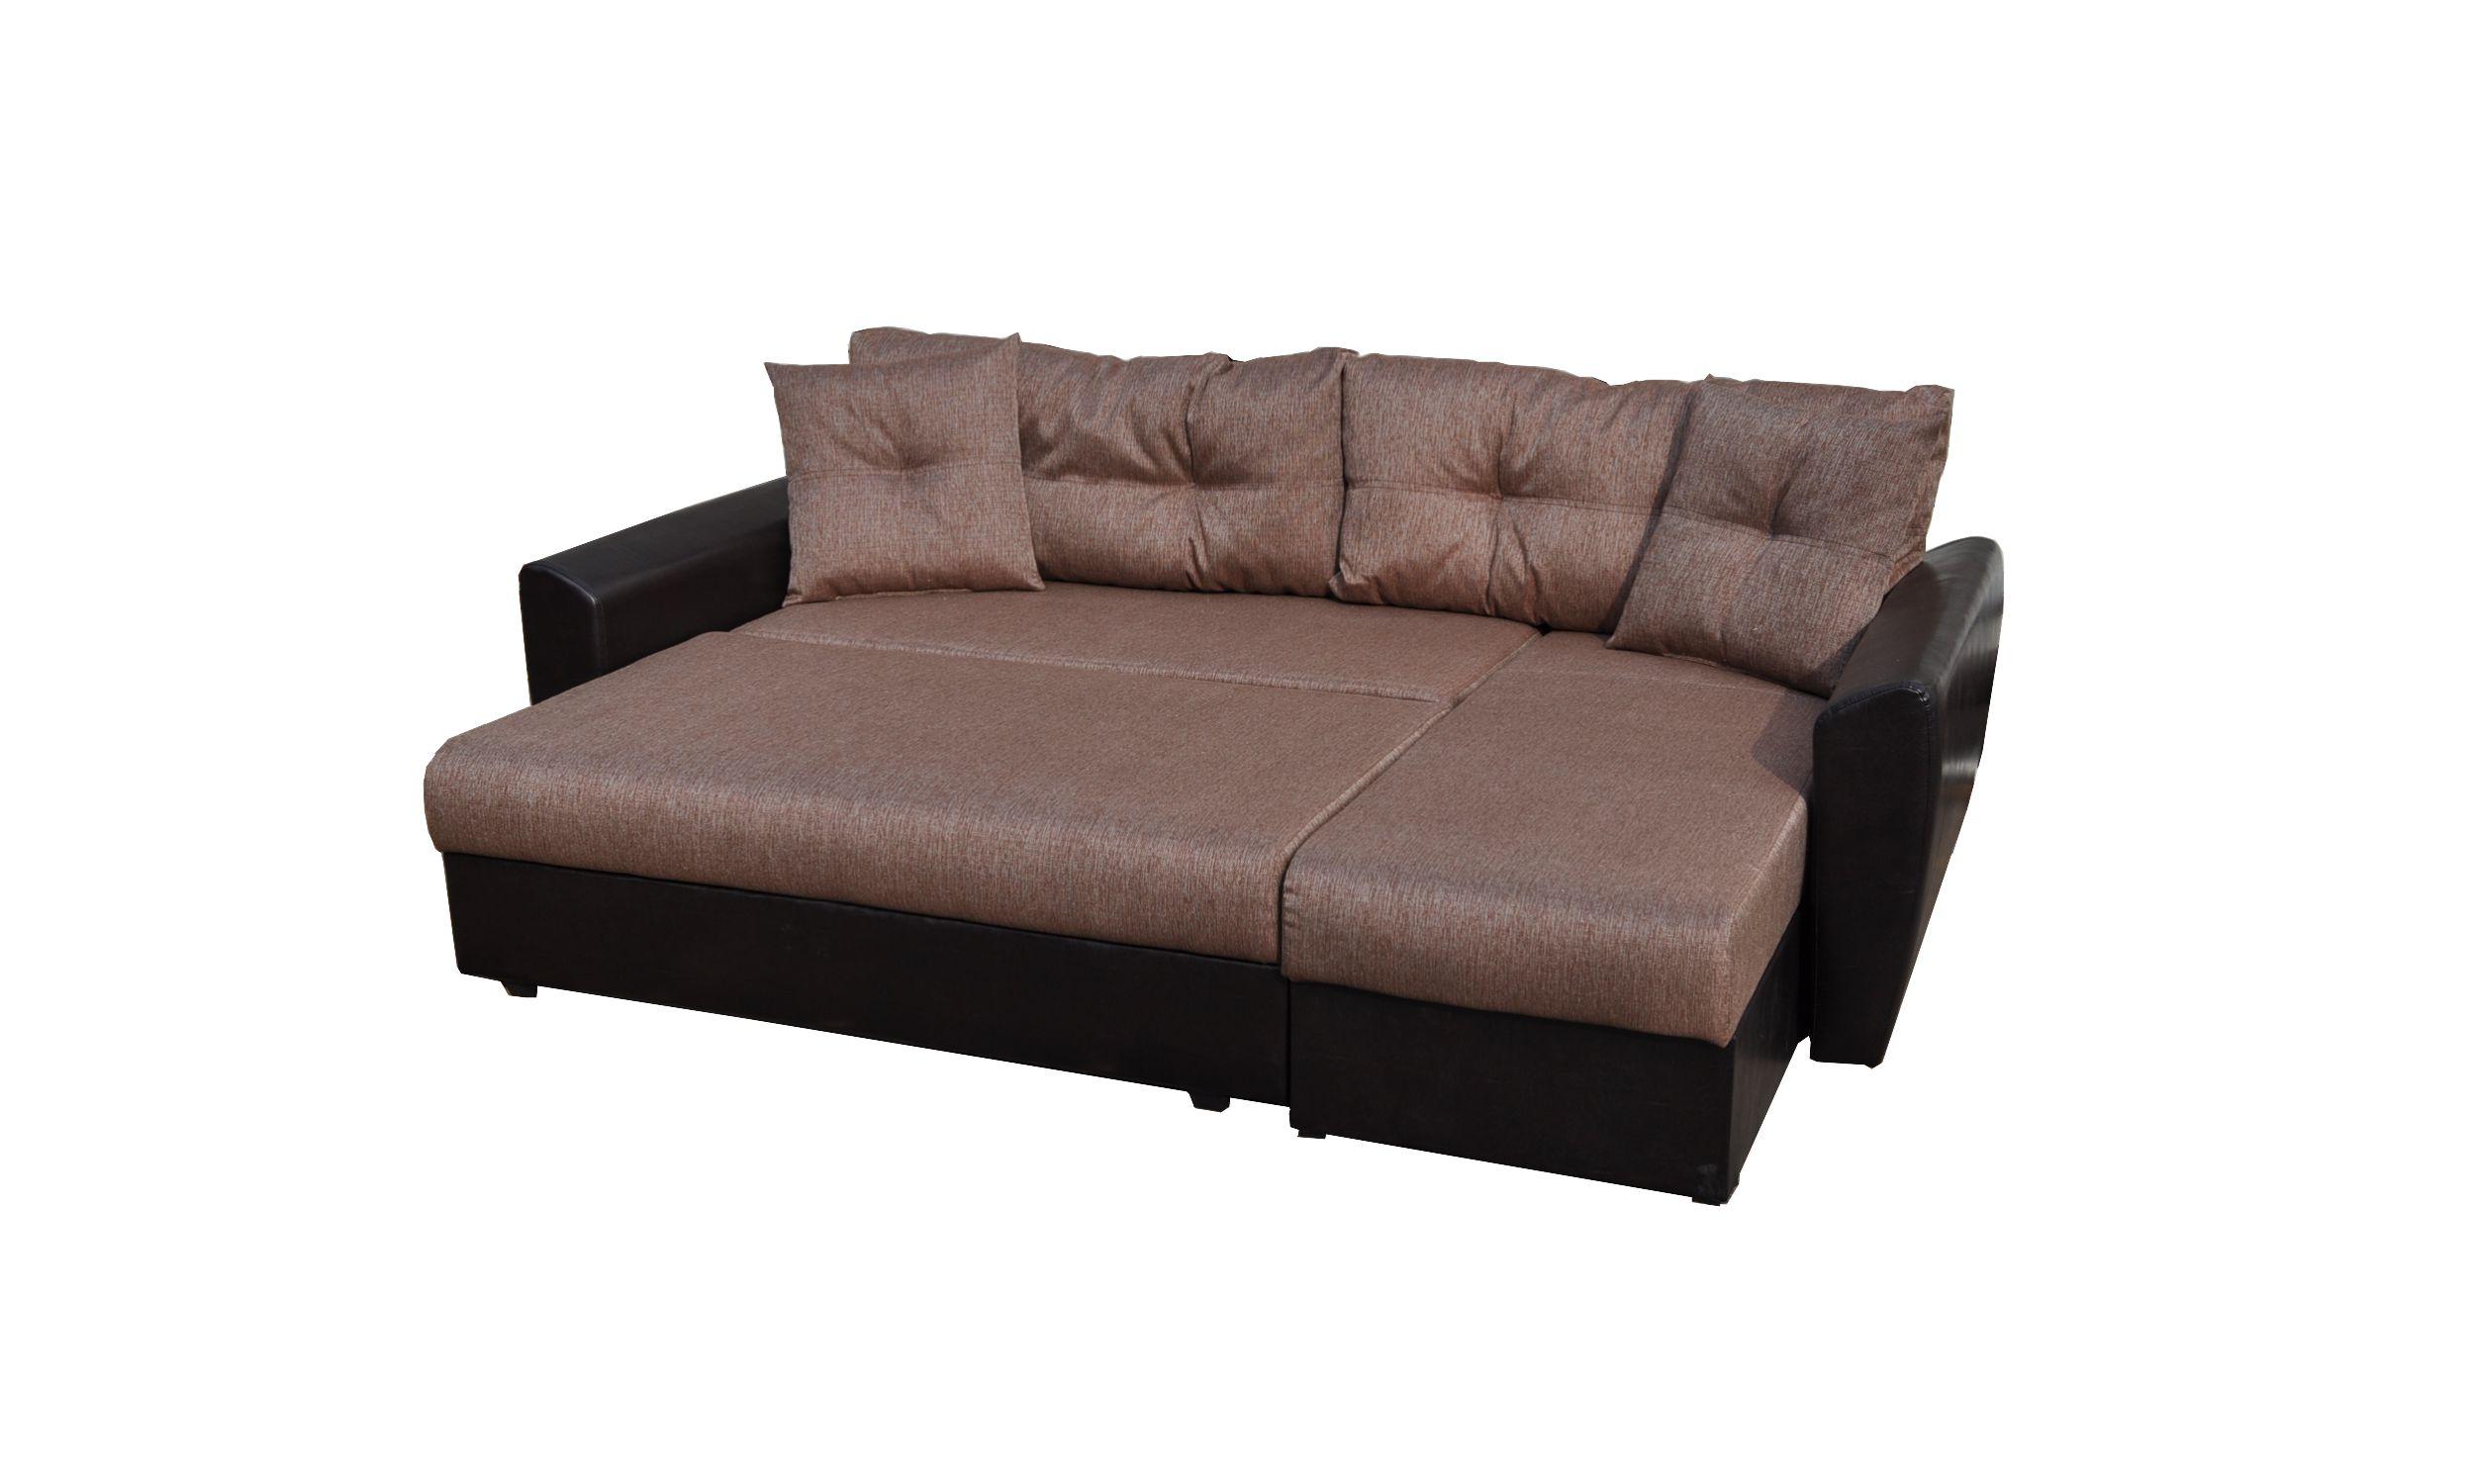 Подушки для дивана Моск обл